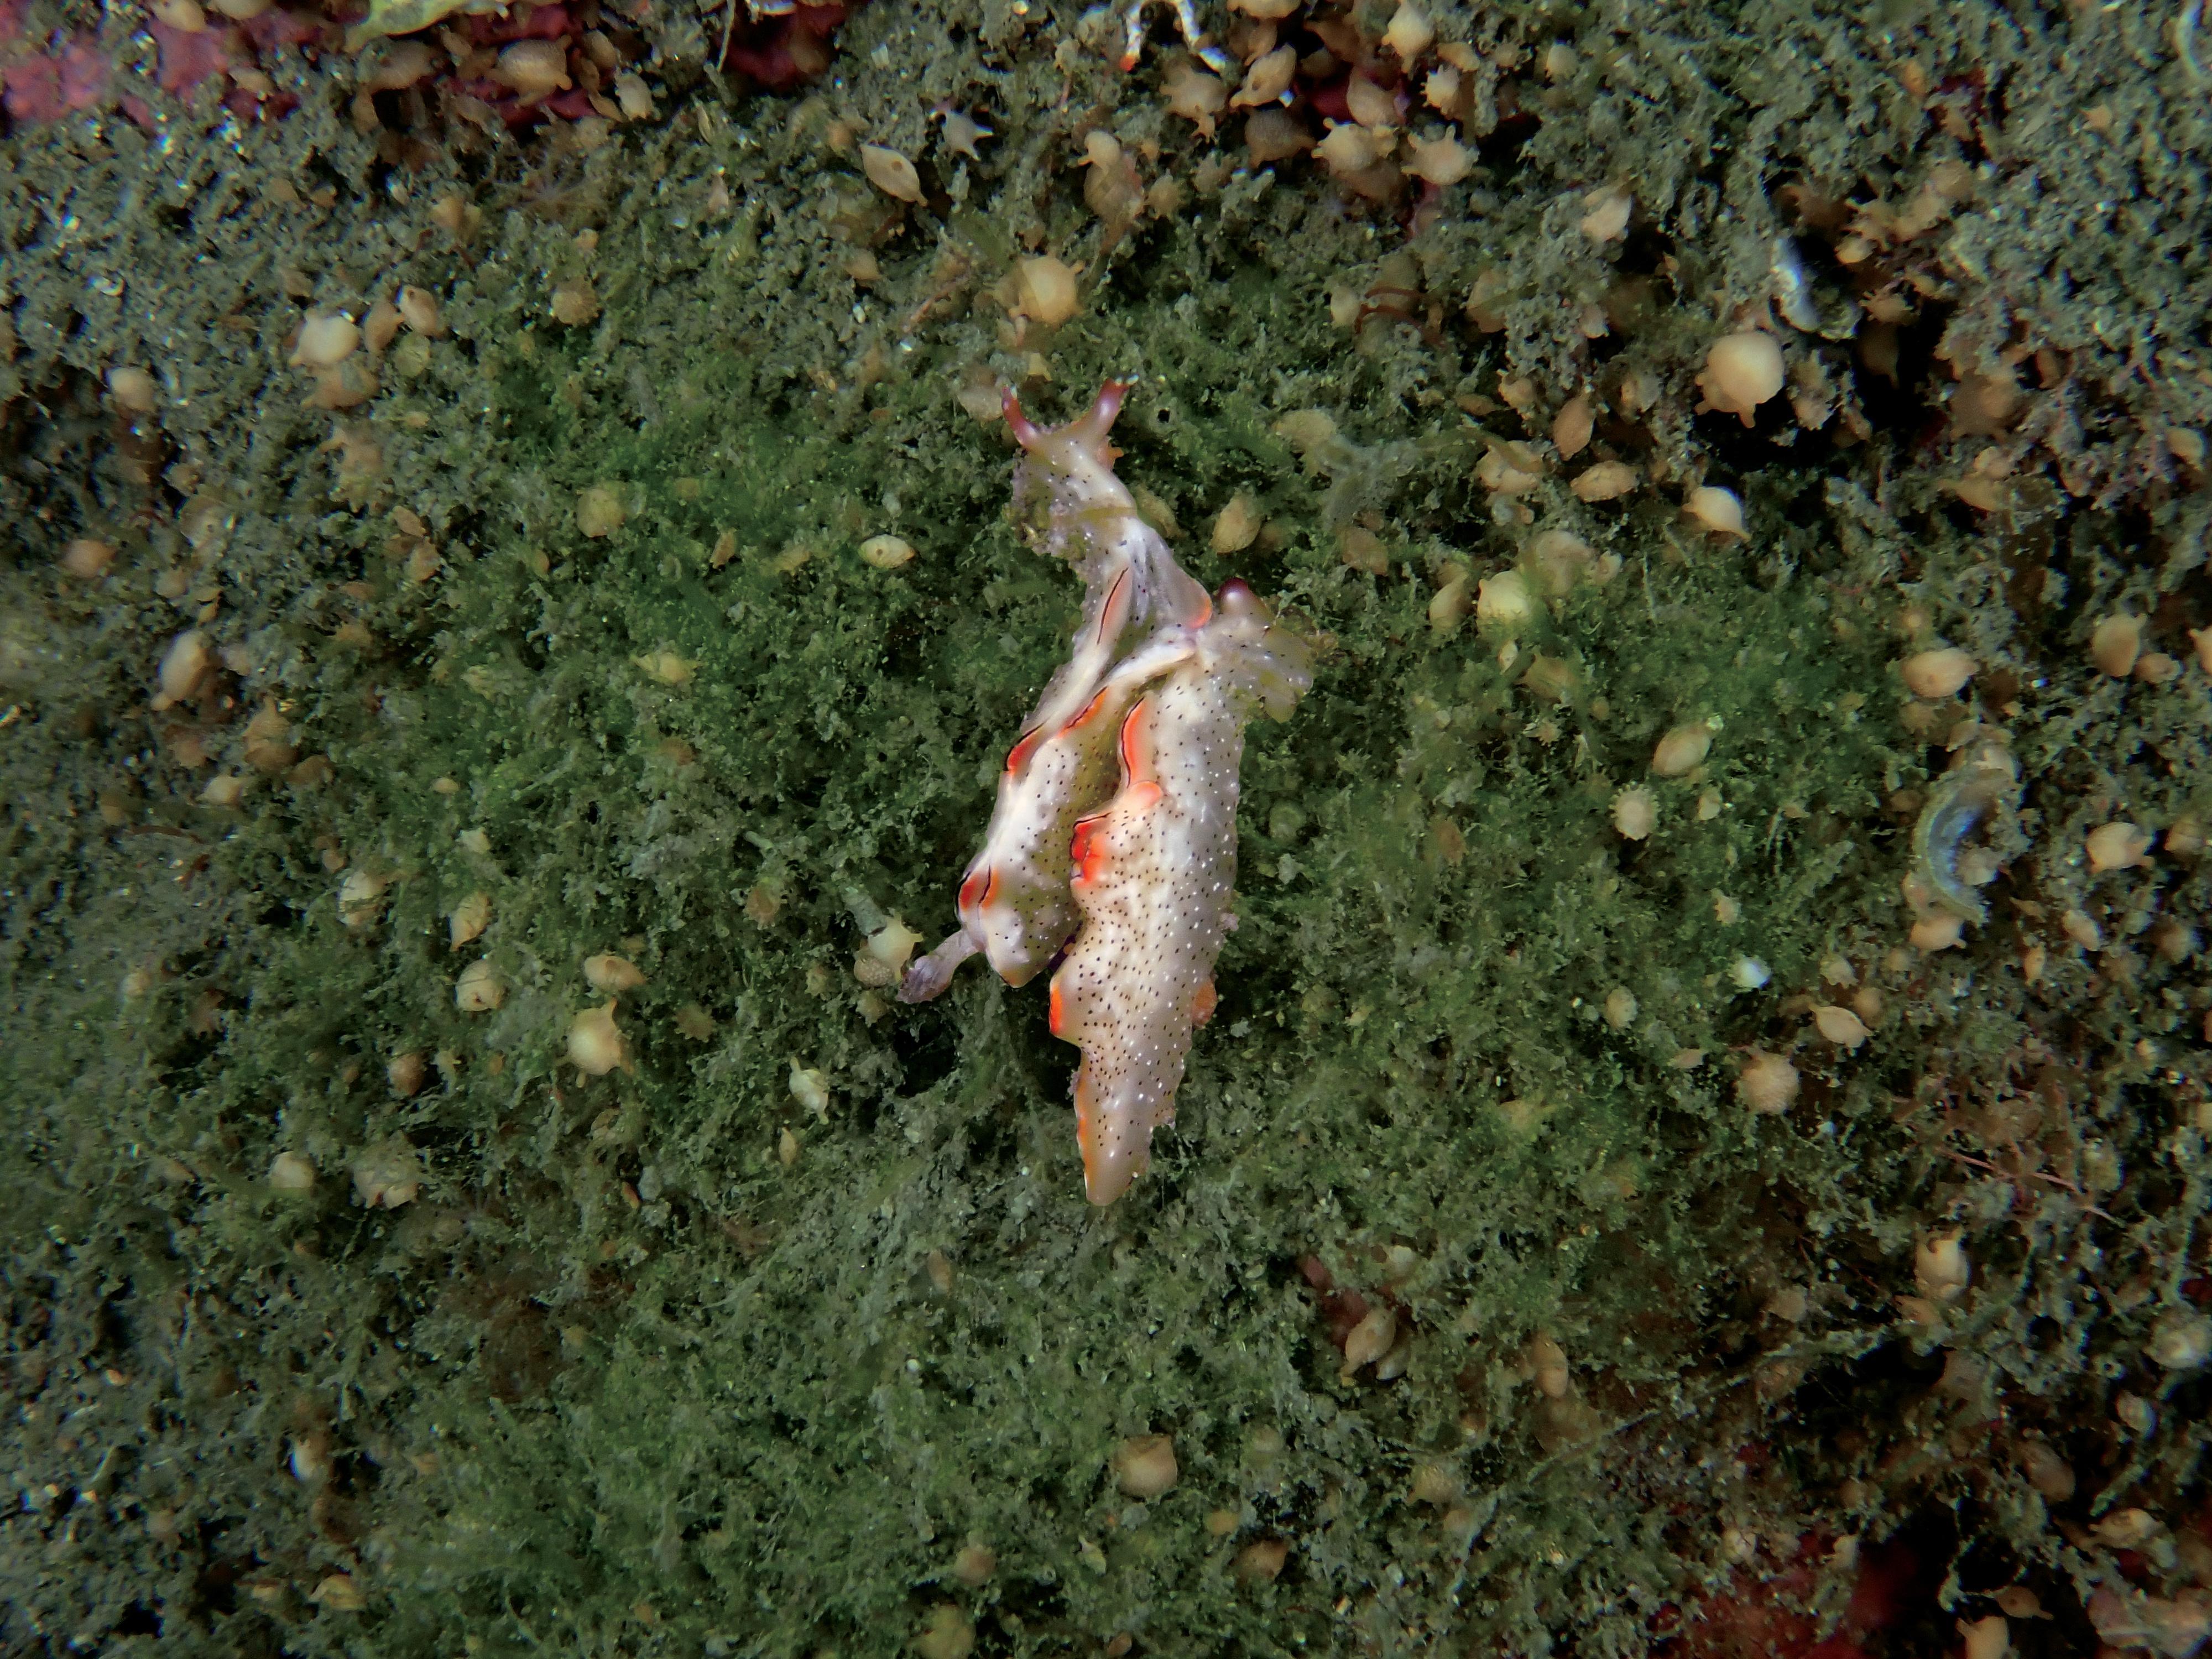 Philip Wong - 西吉城堡 - 囊舌目海天牛海蛞蝓交配圖